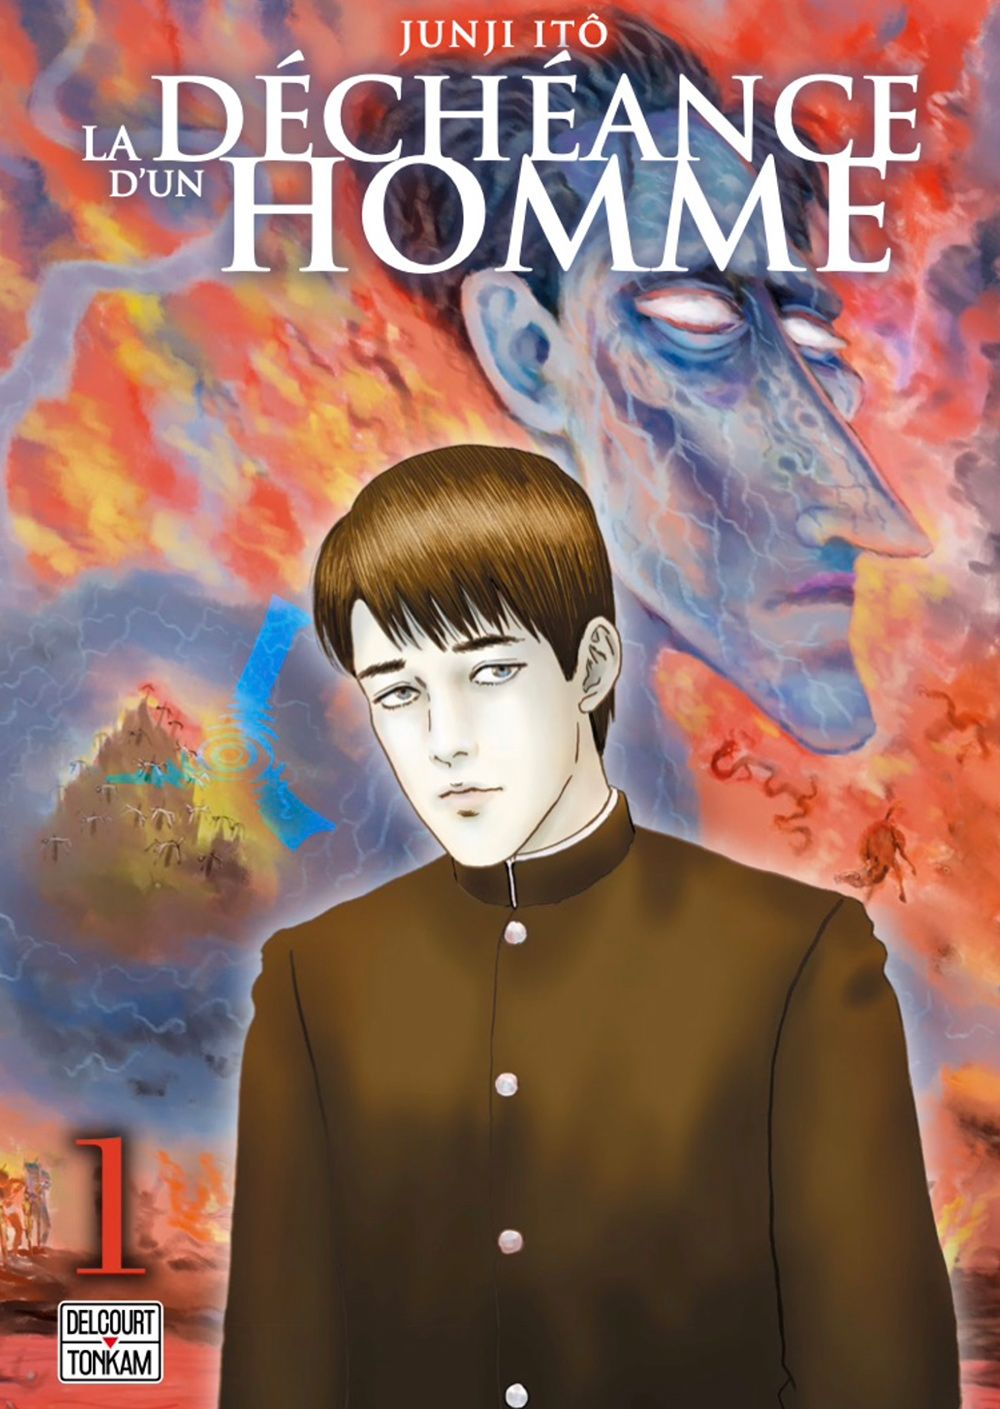 Sortie Manga au Québec JUIN 2021 Decheance-dun-homme-1-delcourt